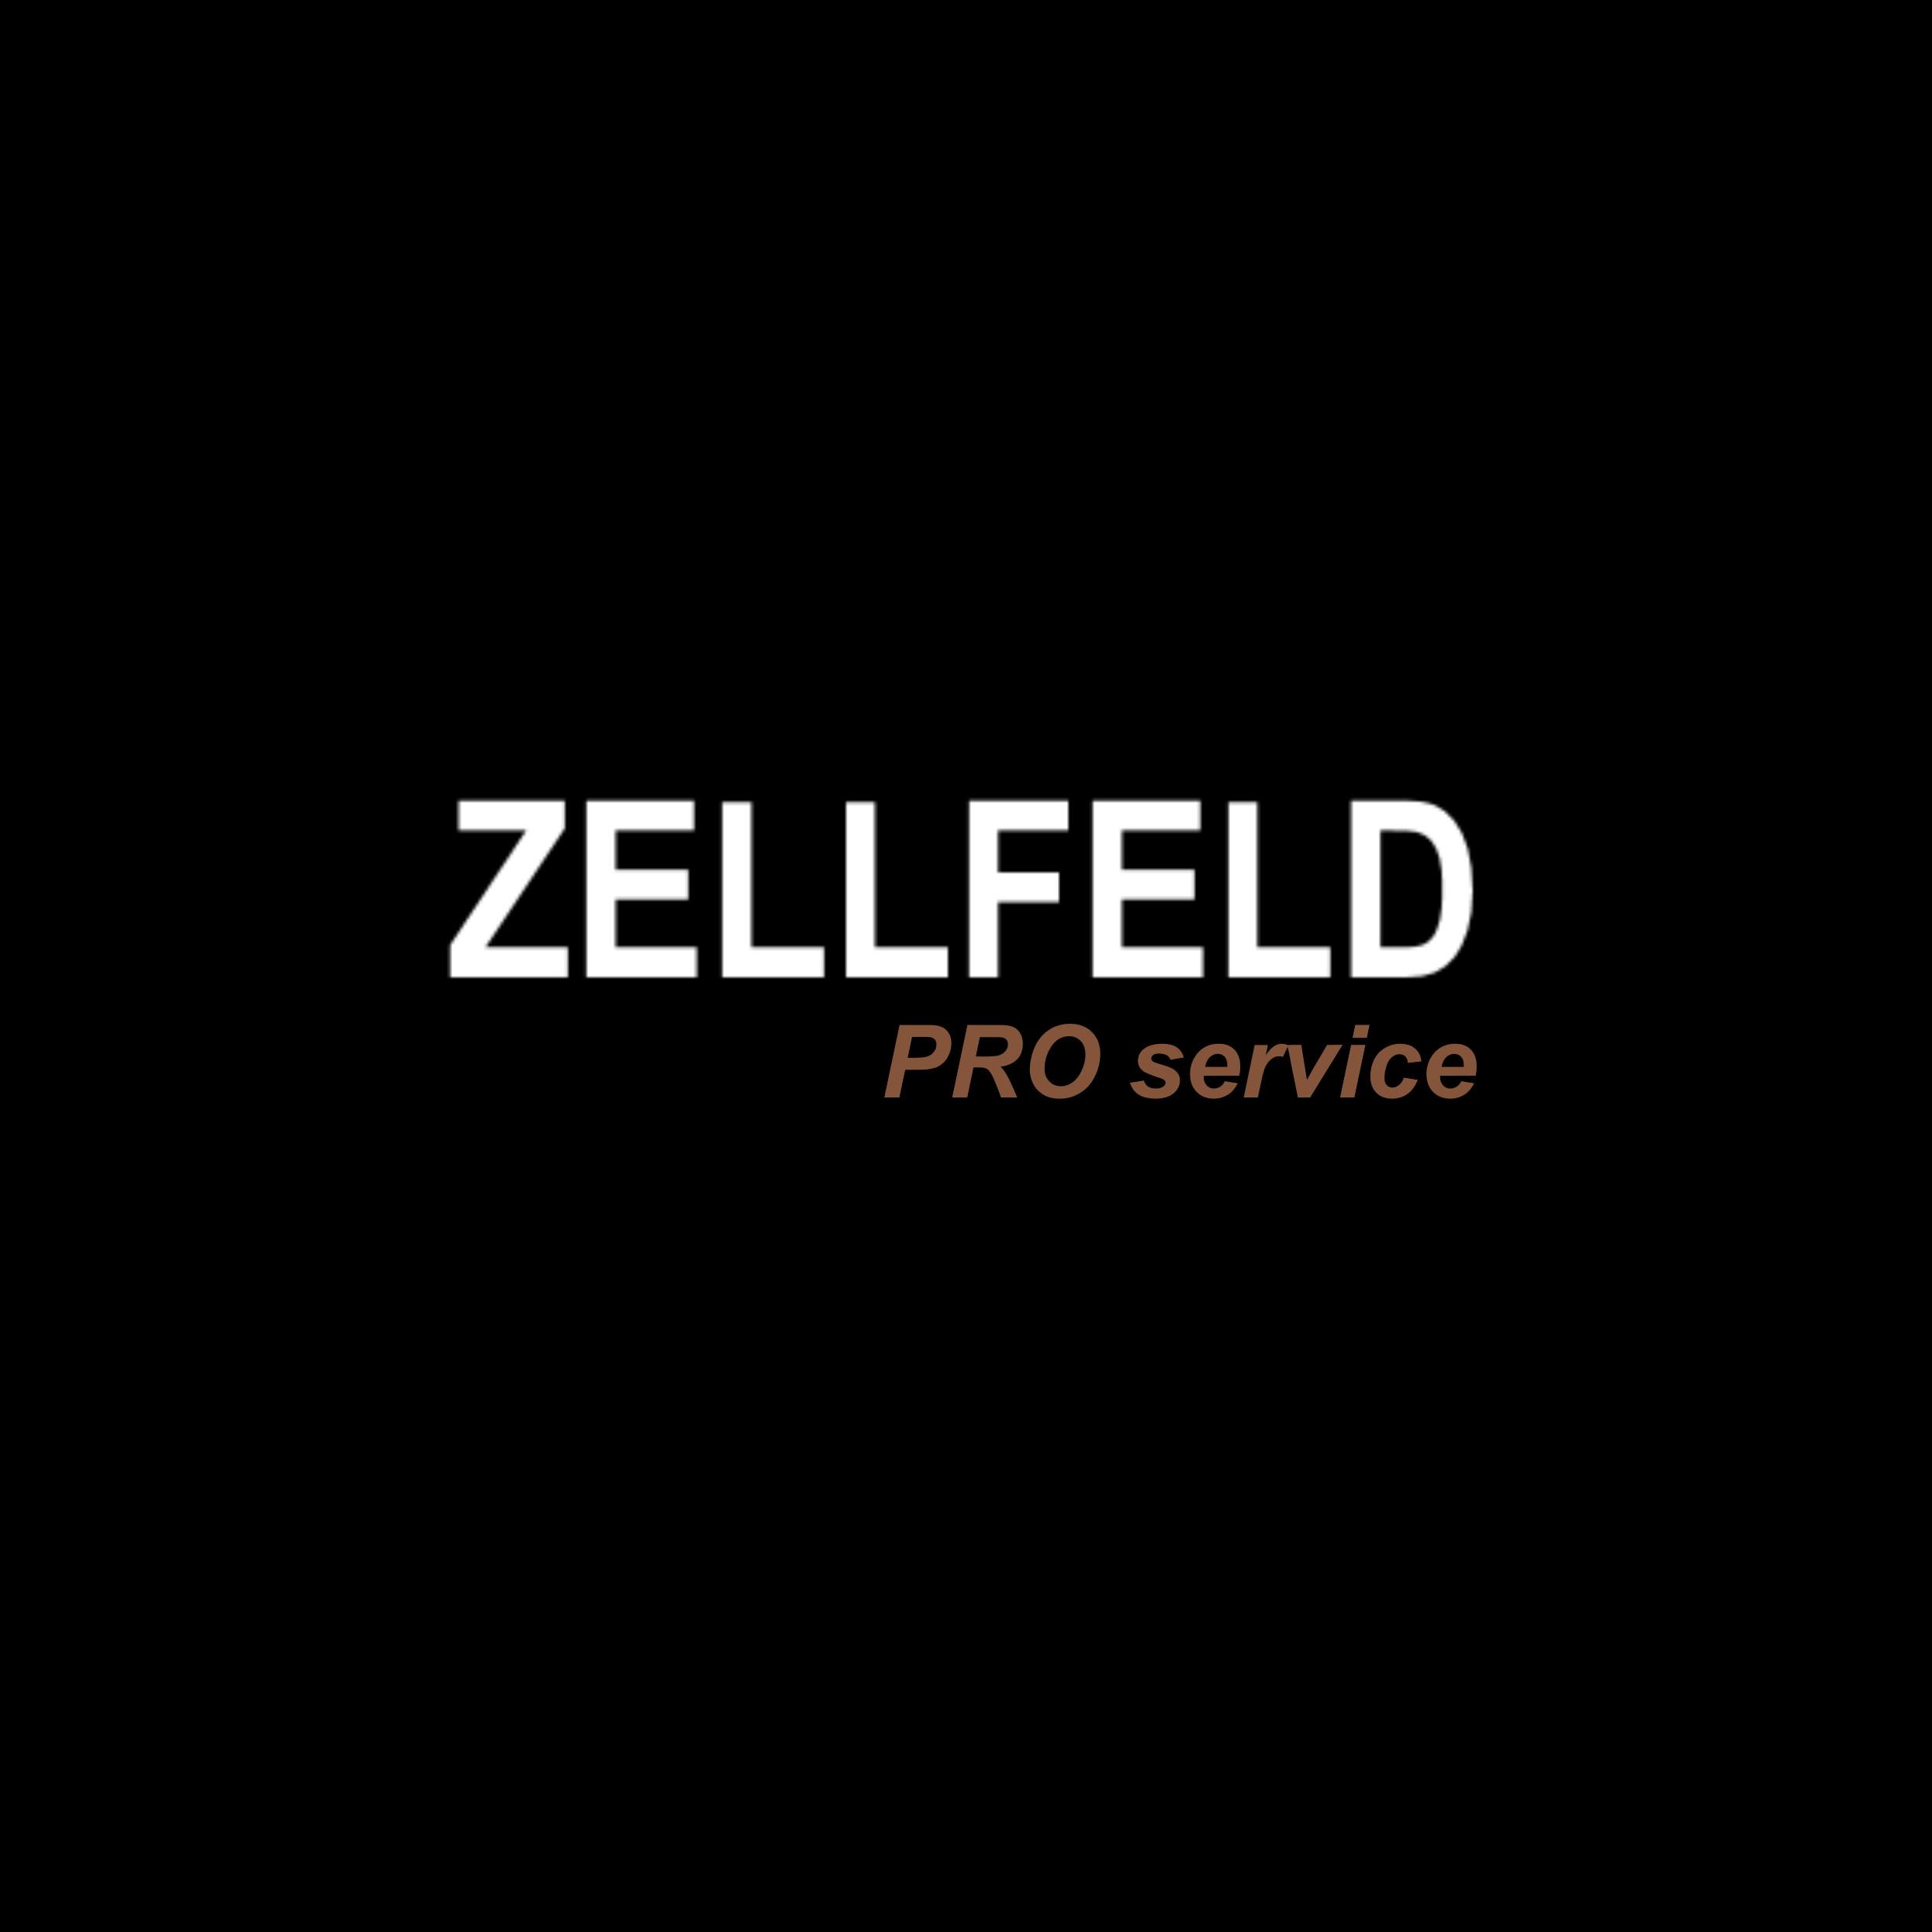 Zellfeld Pro Service